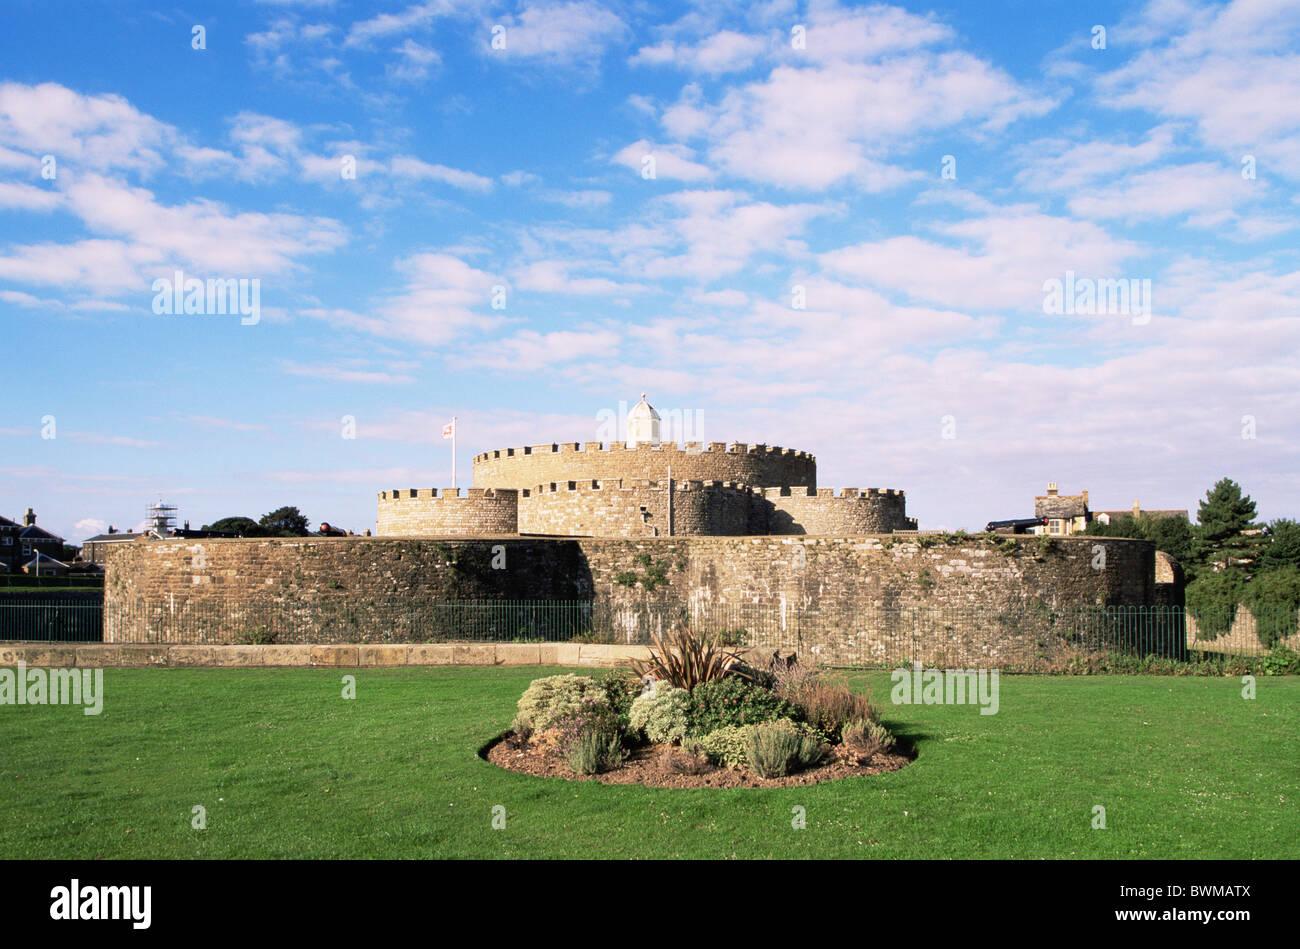 UK England Europe Kent Deal Tudor Deal castle Castles Historic United Kingdom Great Britain Europe history - Stock Image